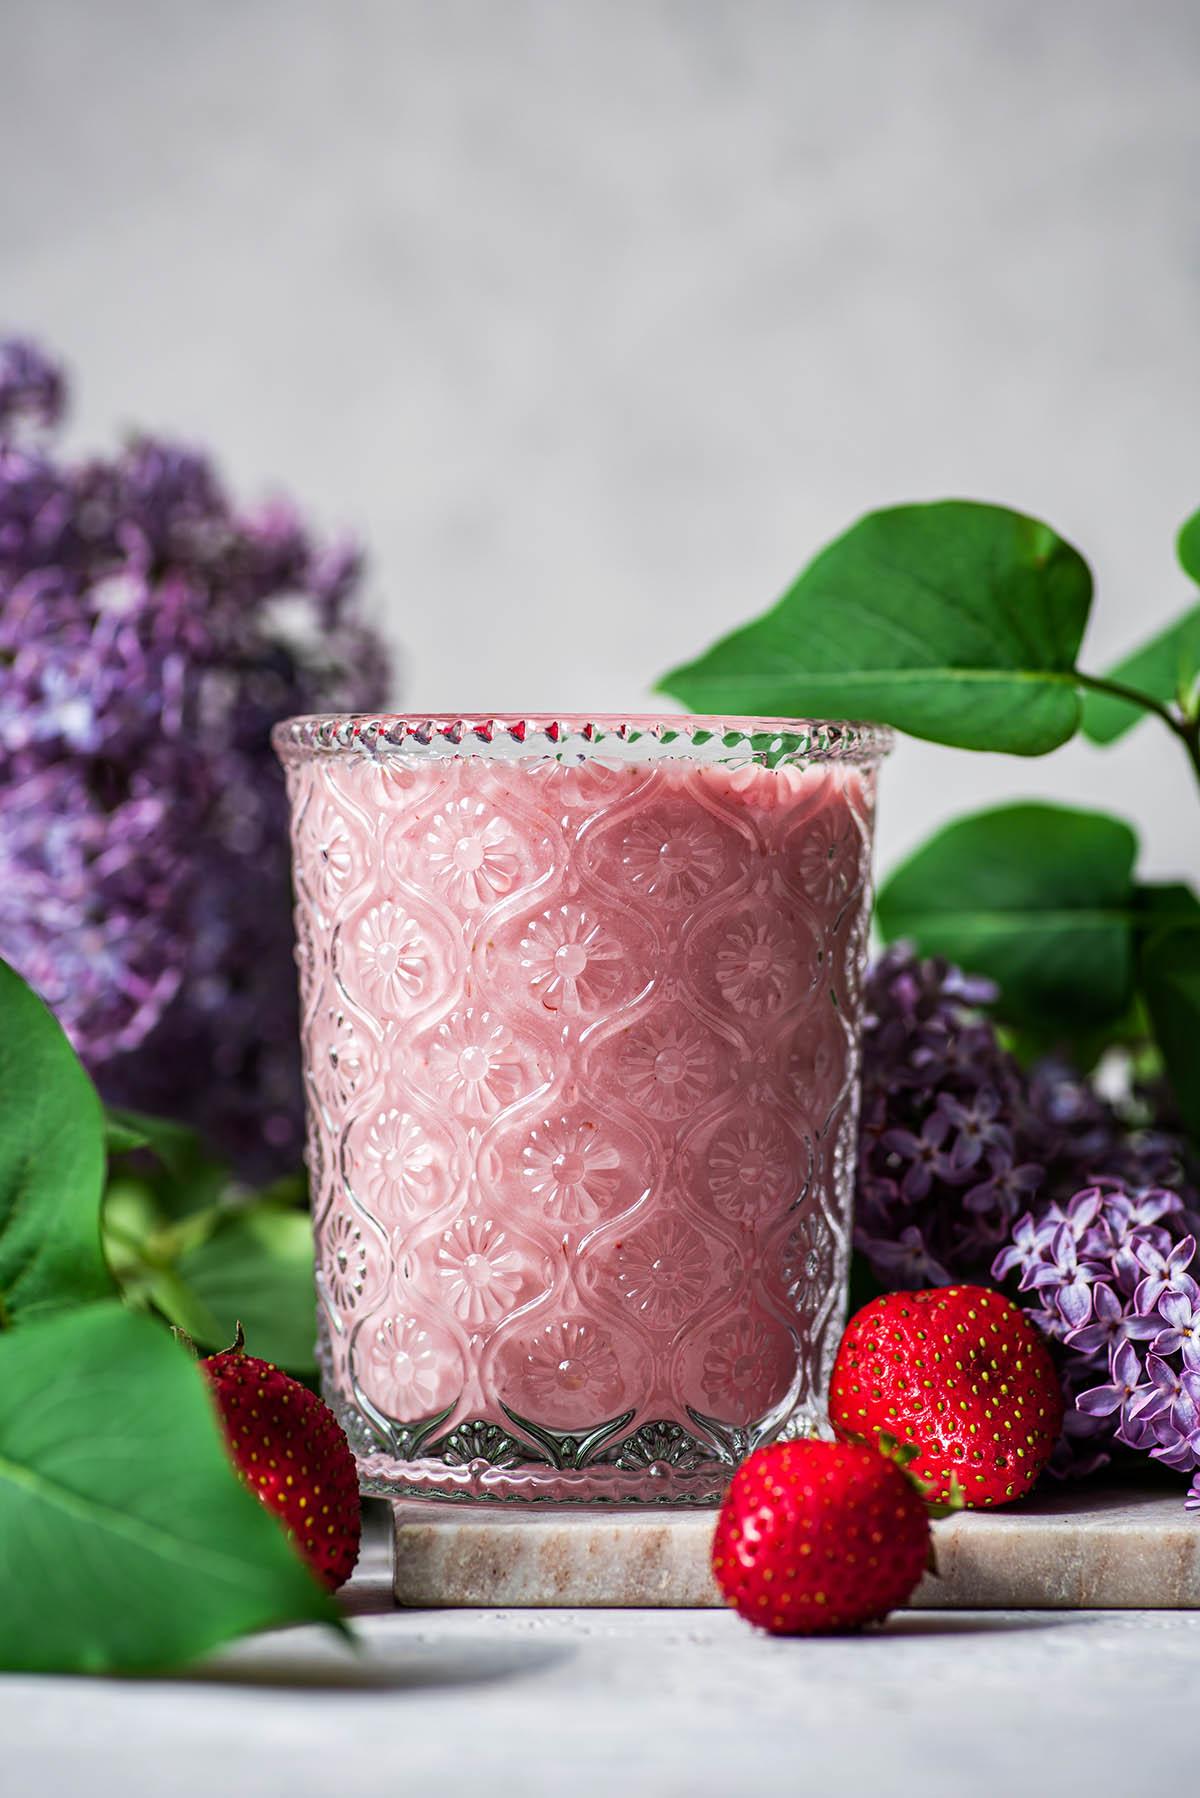 Strawberry milk in a flower glass.